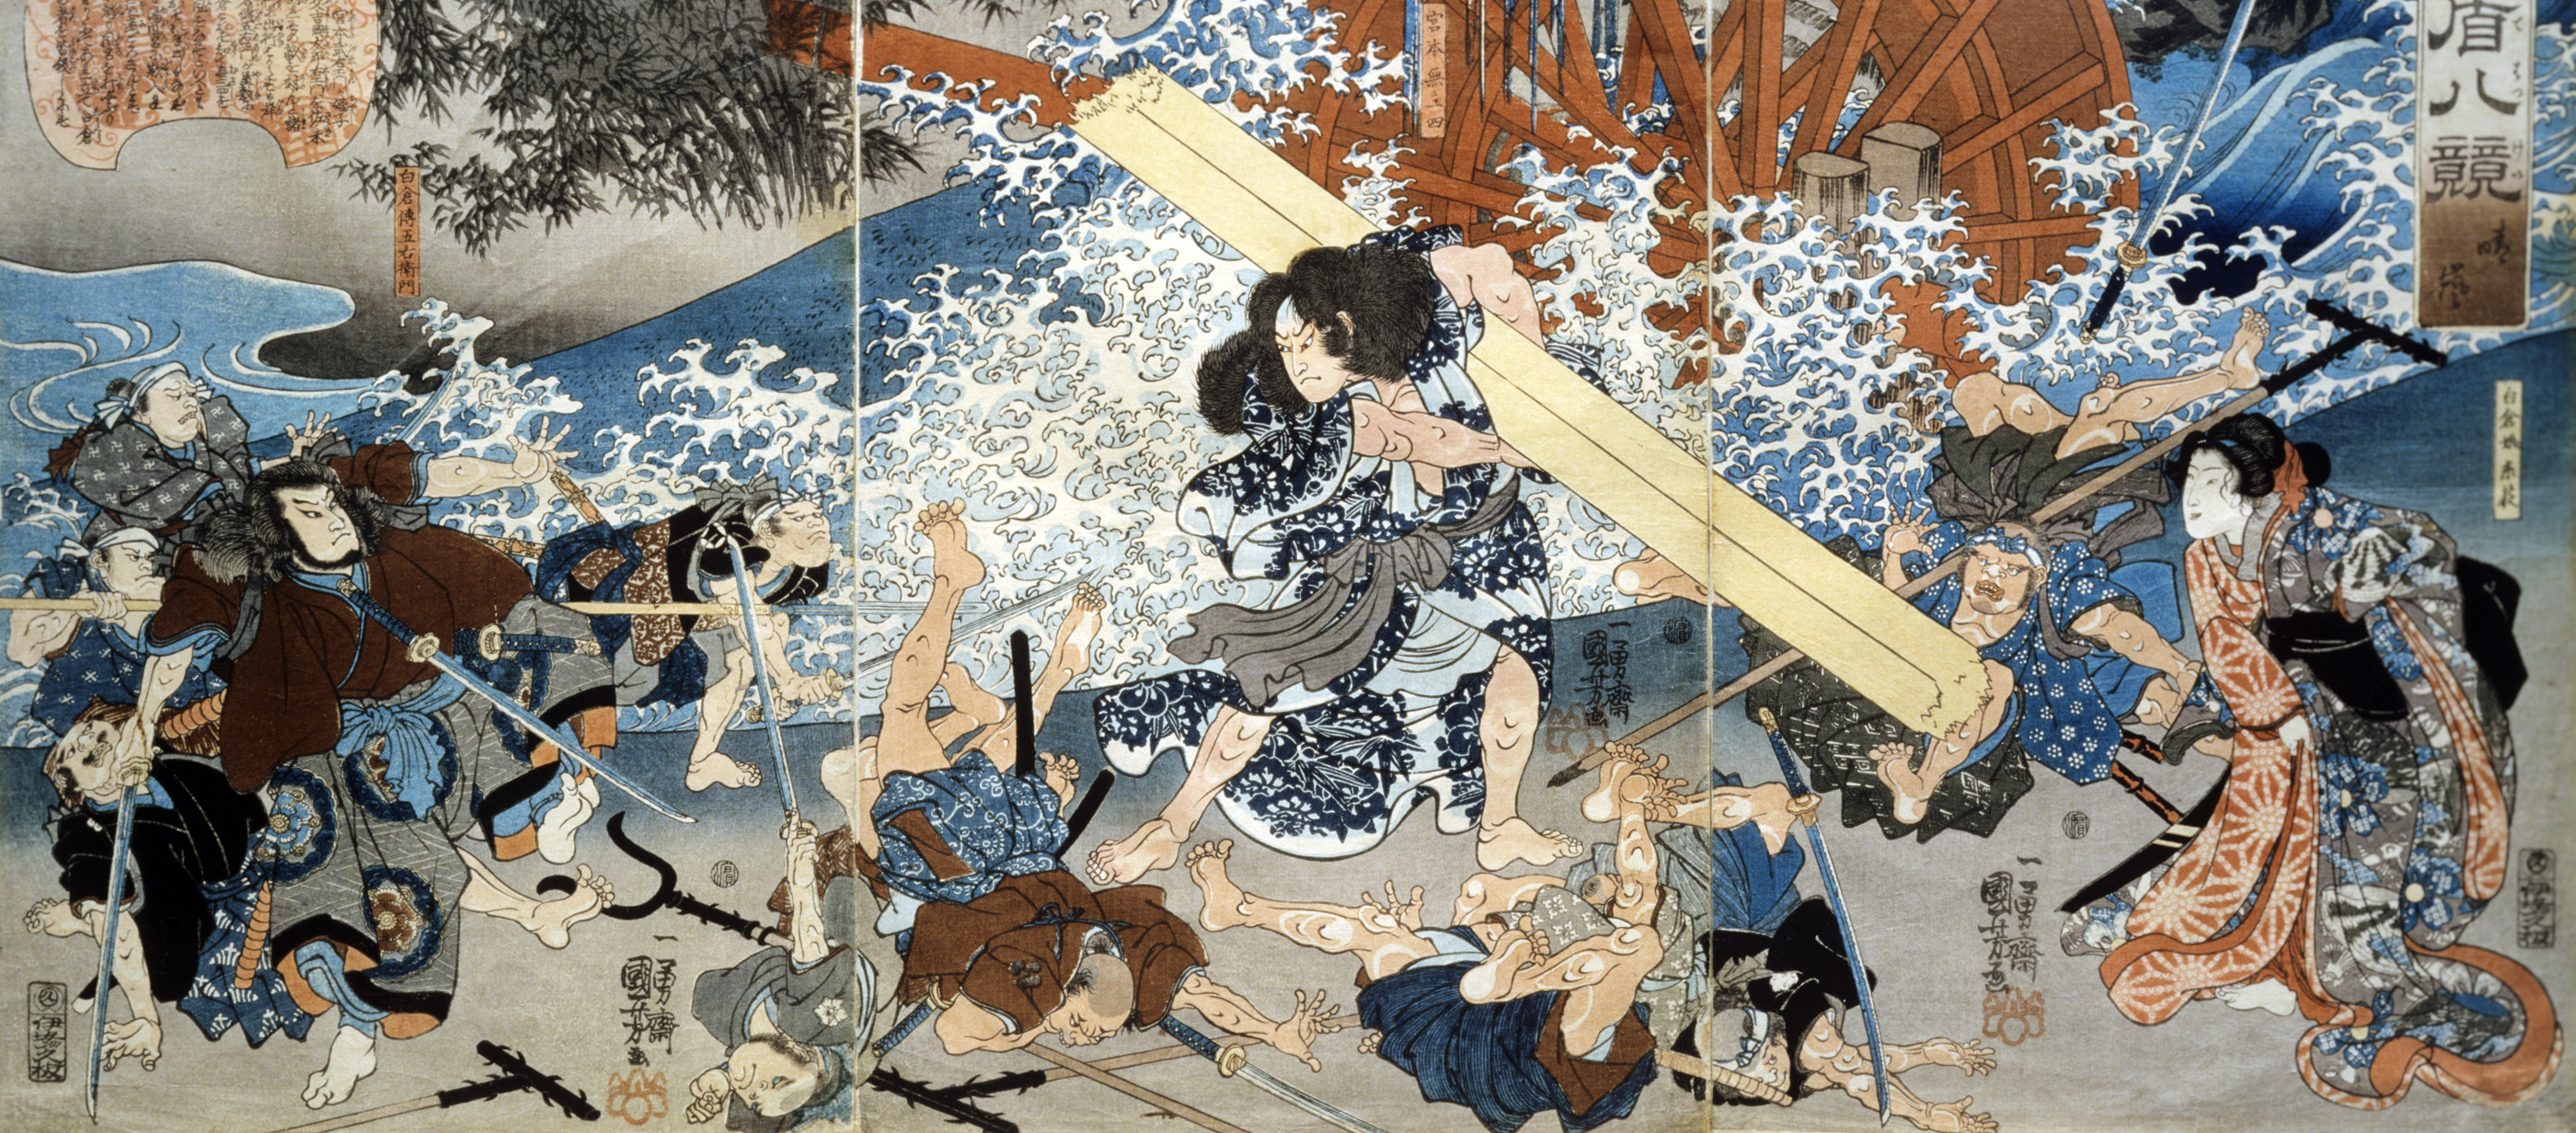 "Miyamoto Musashi, Tokugawa-period warrior known in Japan as the ""sword saint,"" woodcut by Utagawa Kuniyoshi, c. 1838. © Victoria & Albert Museum, London/Art Resource, NY."